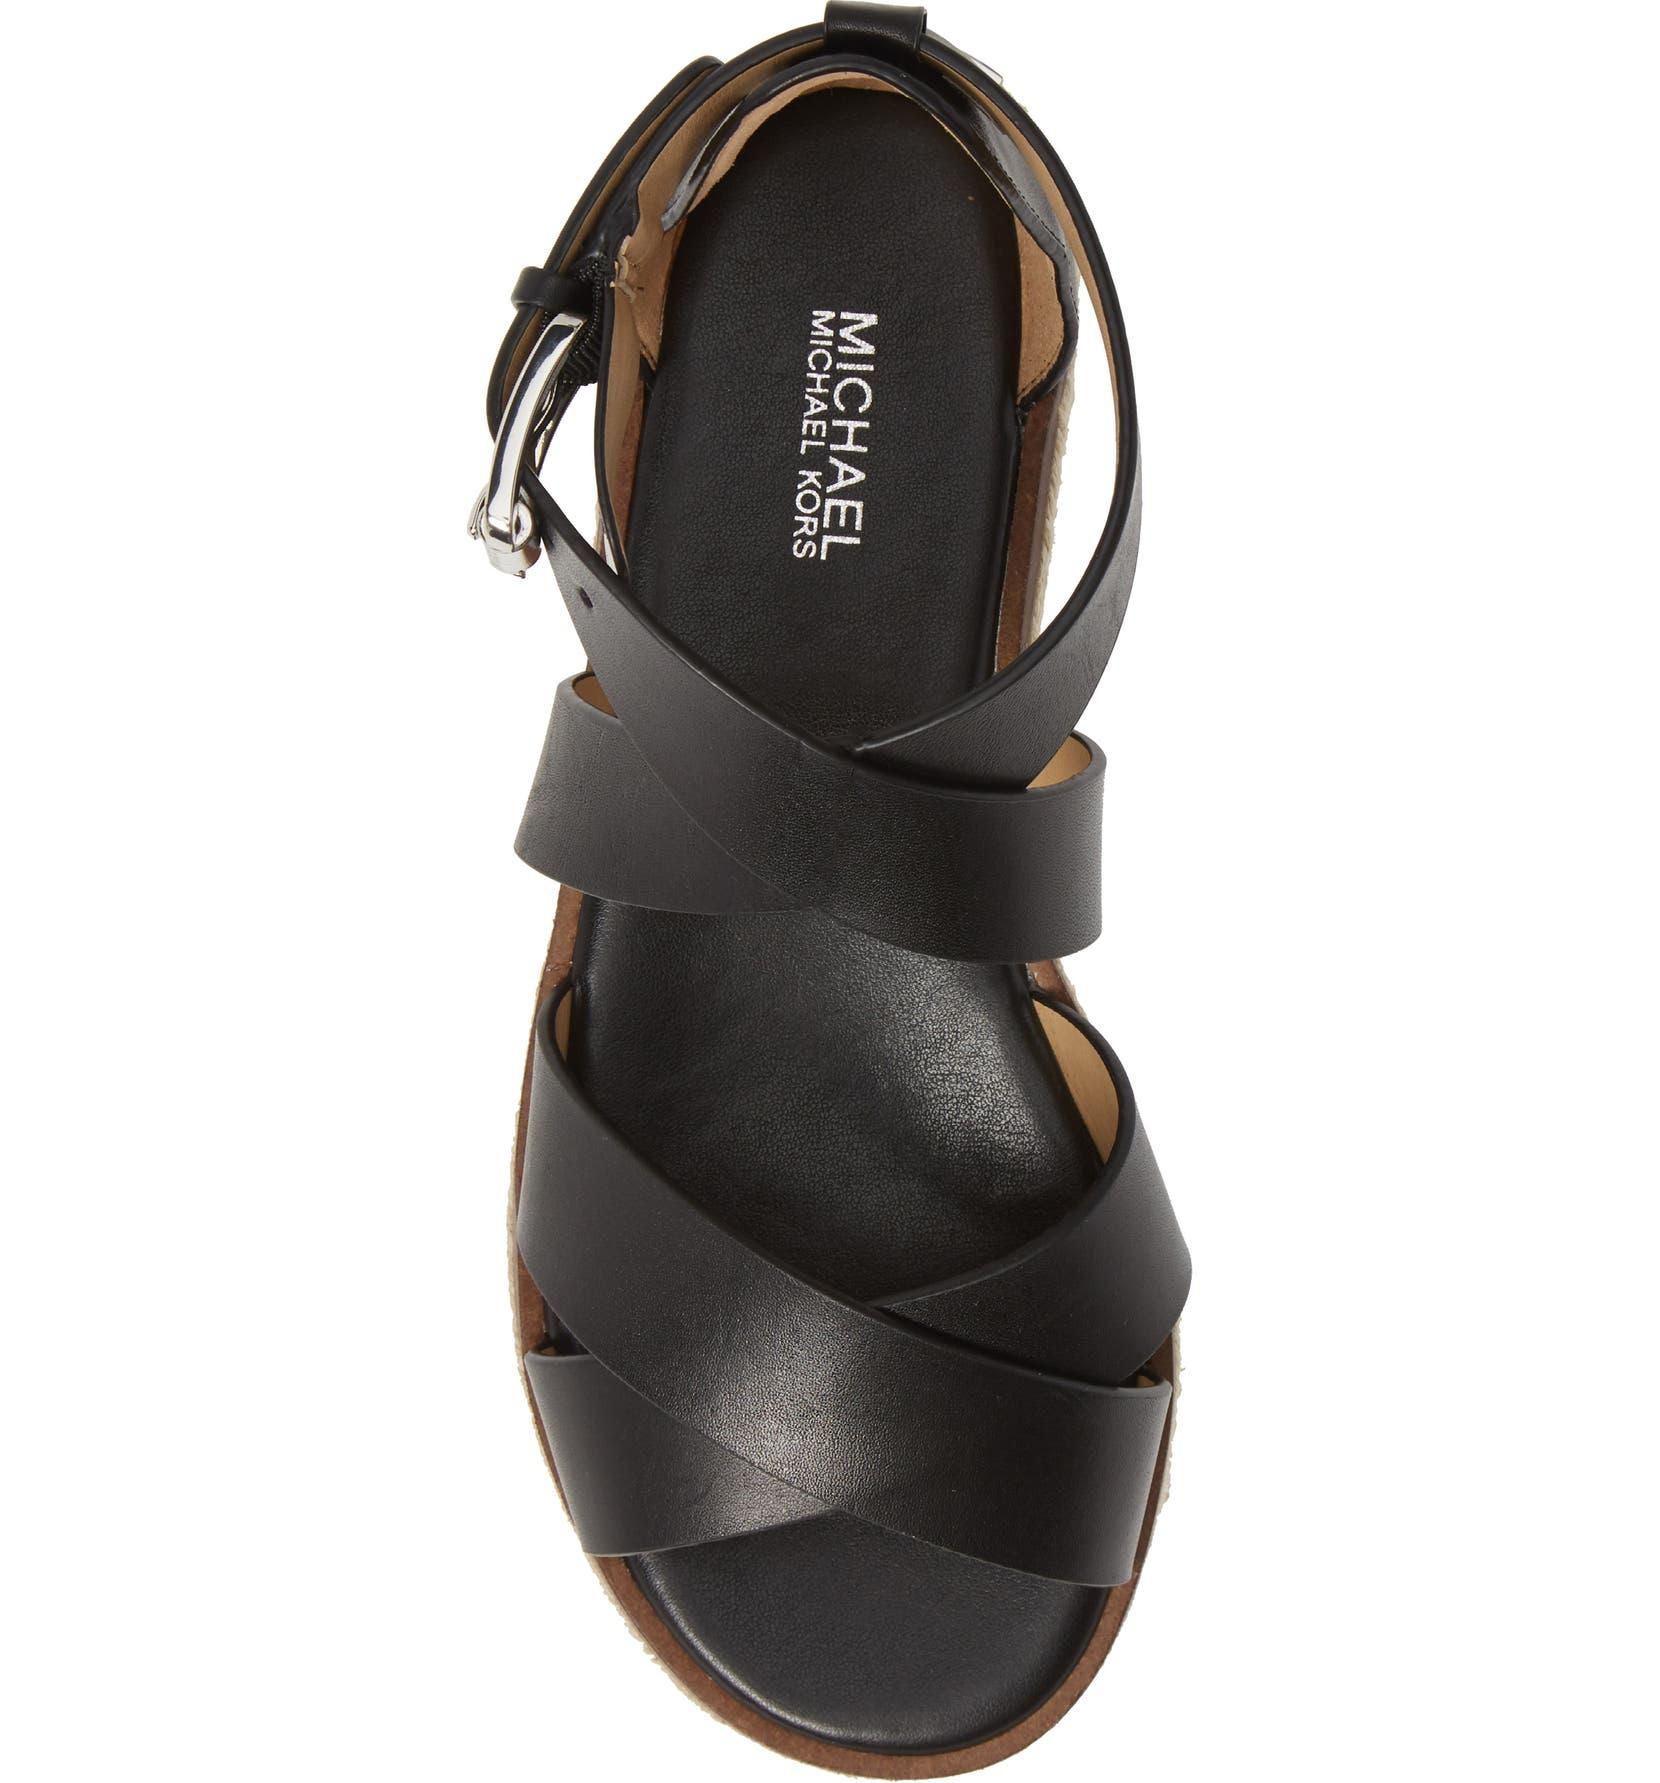 28b11faf166 'Darby' Crisscross Espadrille Sandal